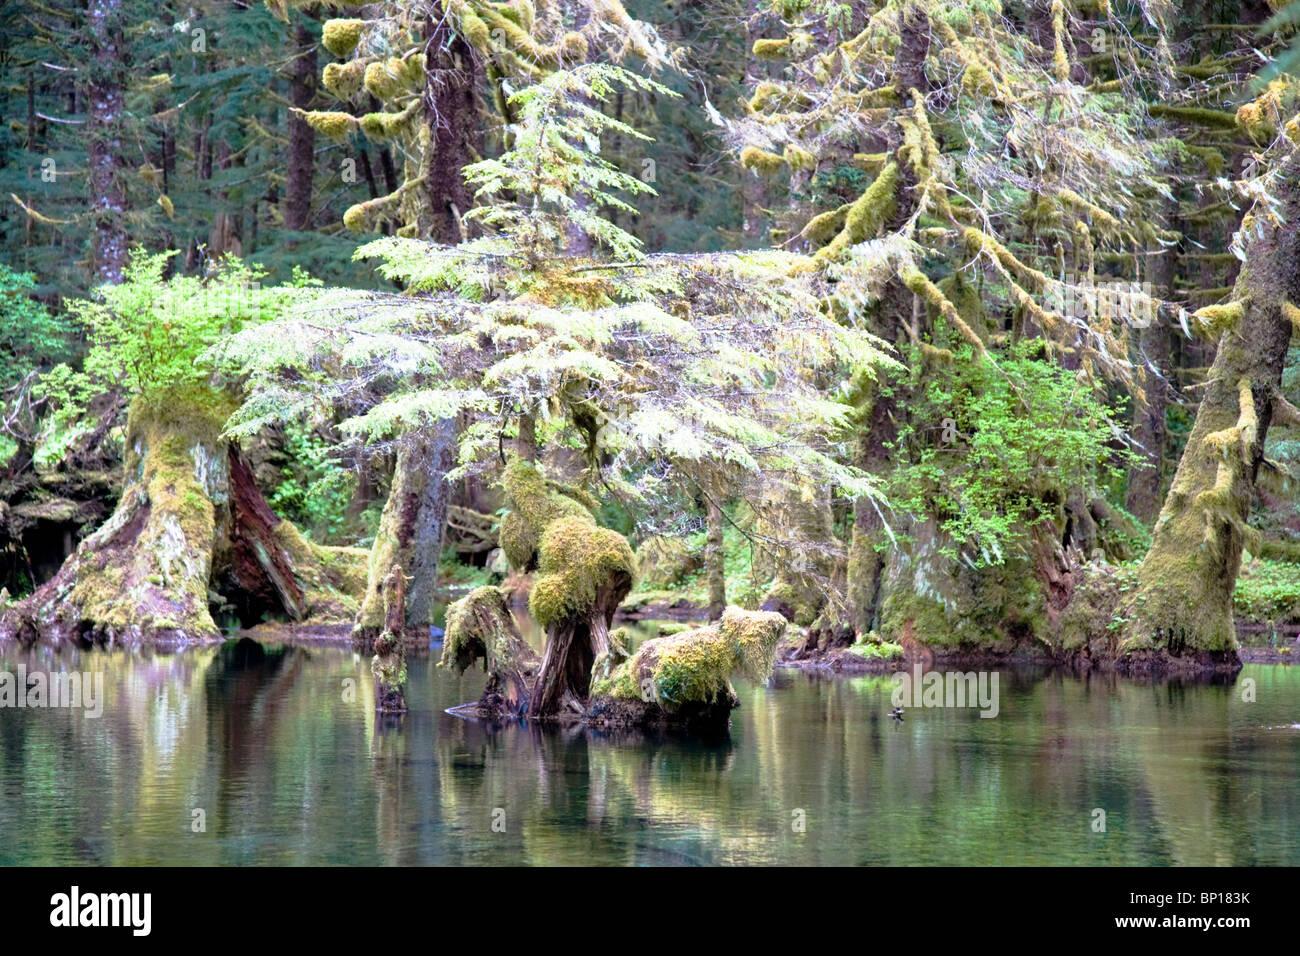 Swamp forest, Kuiu Island, Tongass National Forest, southeast Alaska, USA. - Stock Image